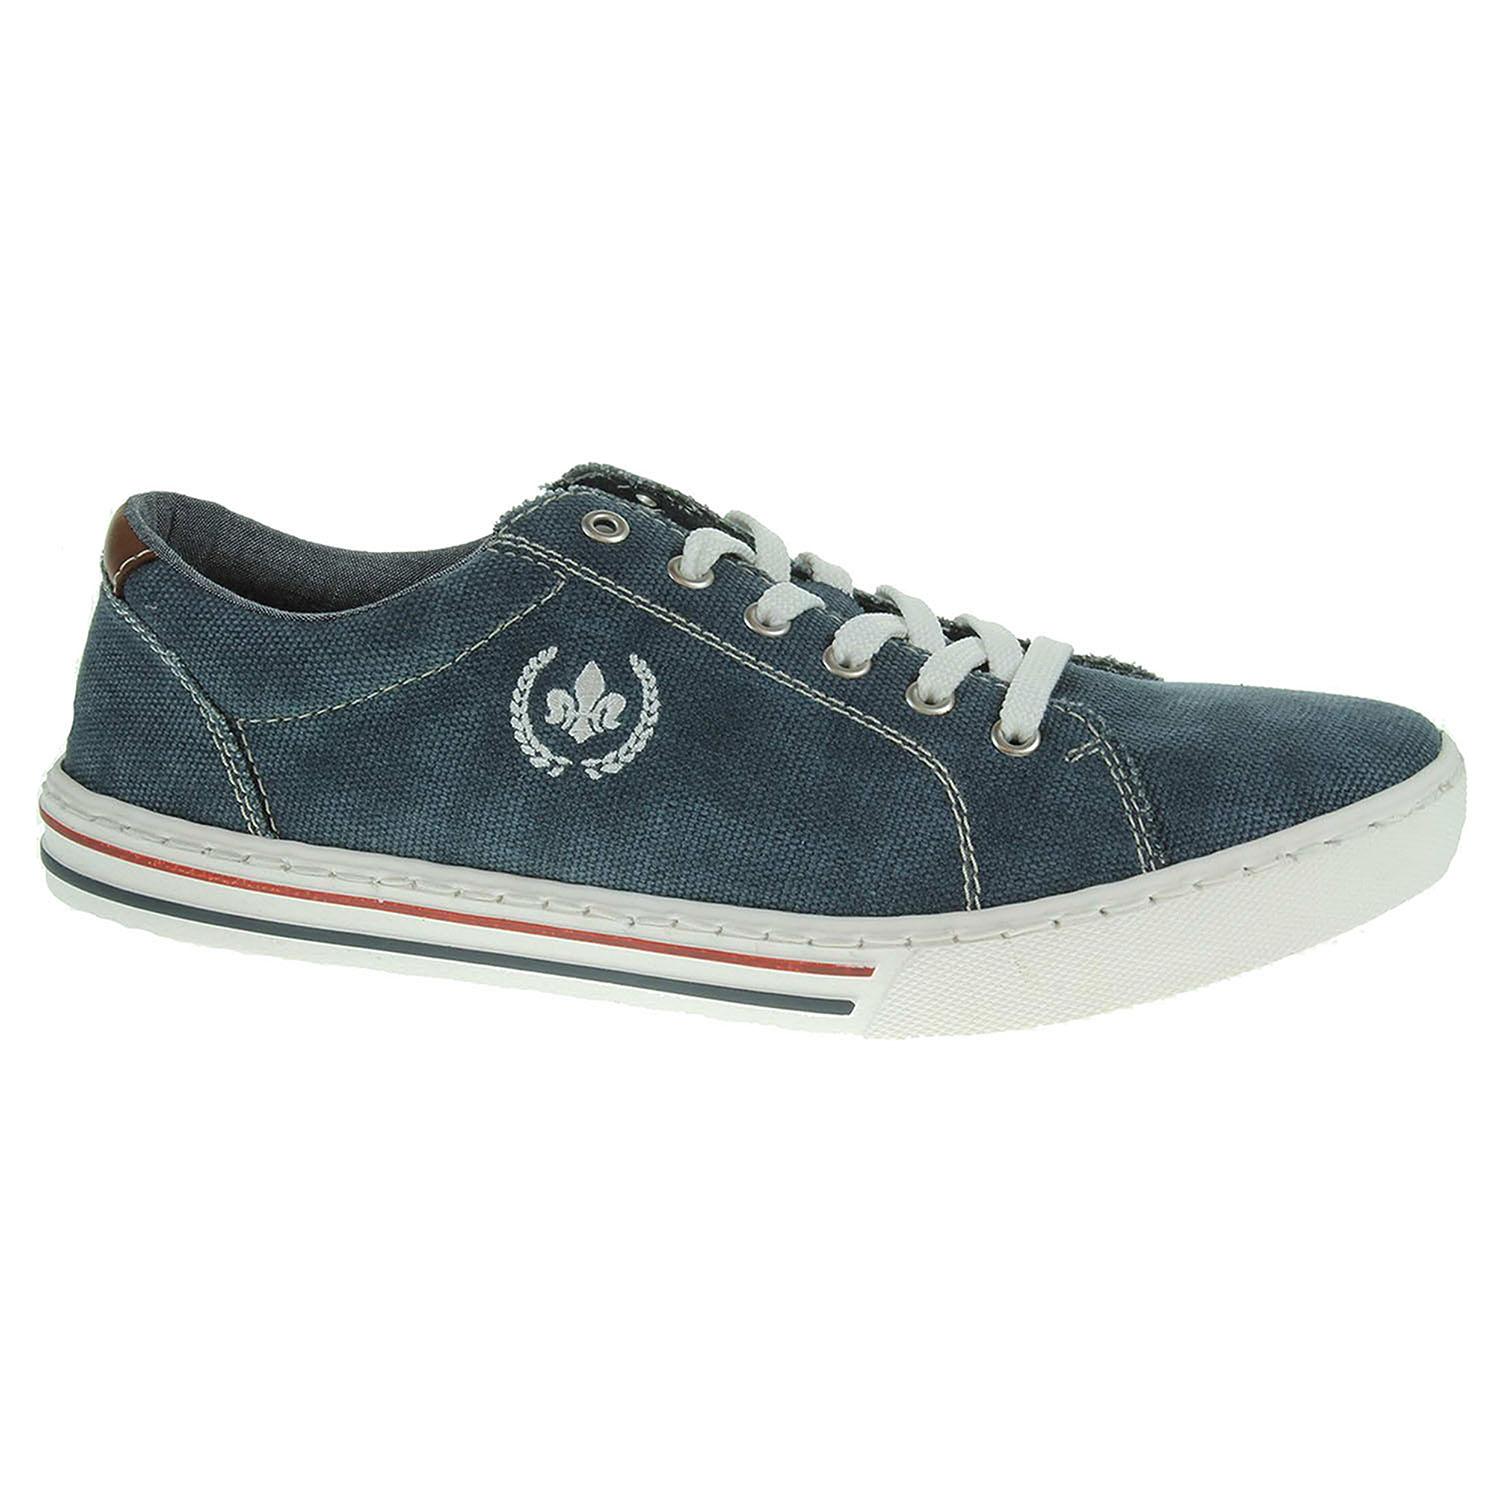 Pánská obuv Rieker 19501-14 modrá 40